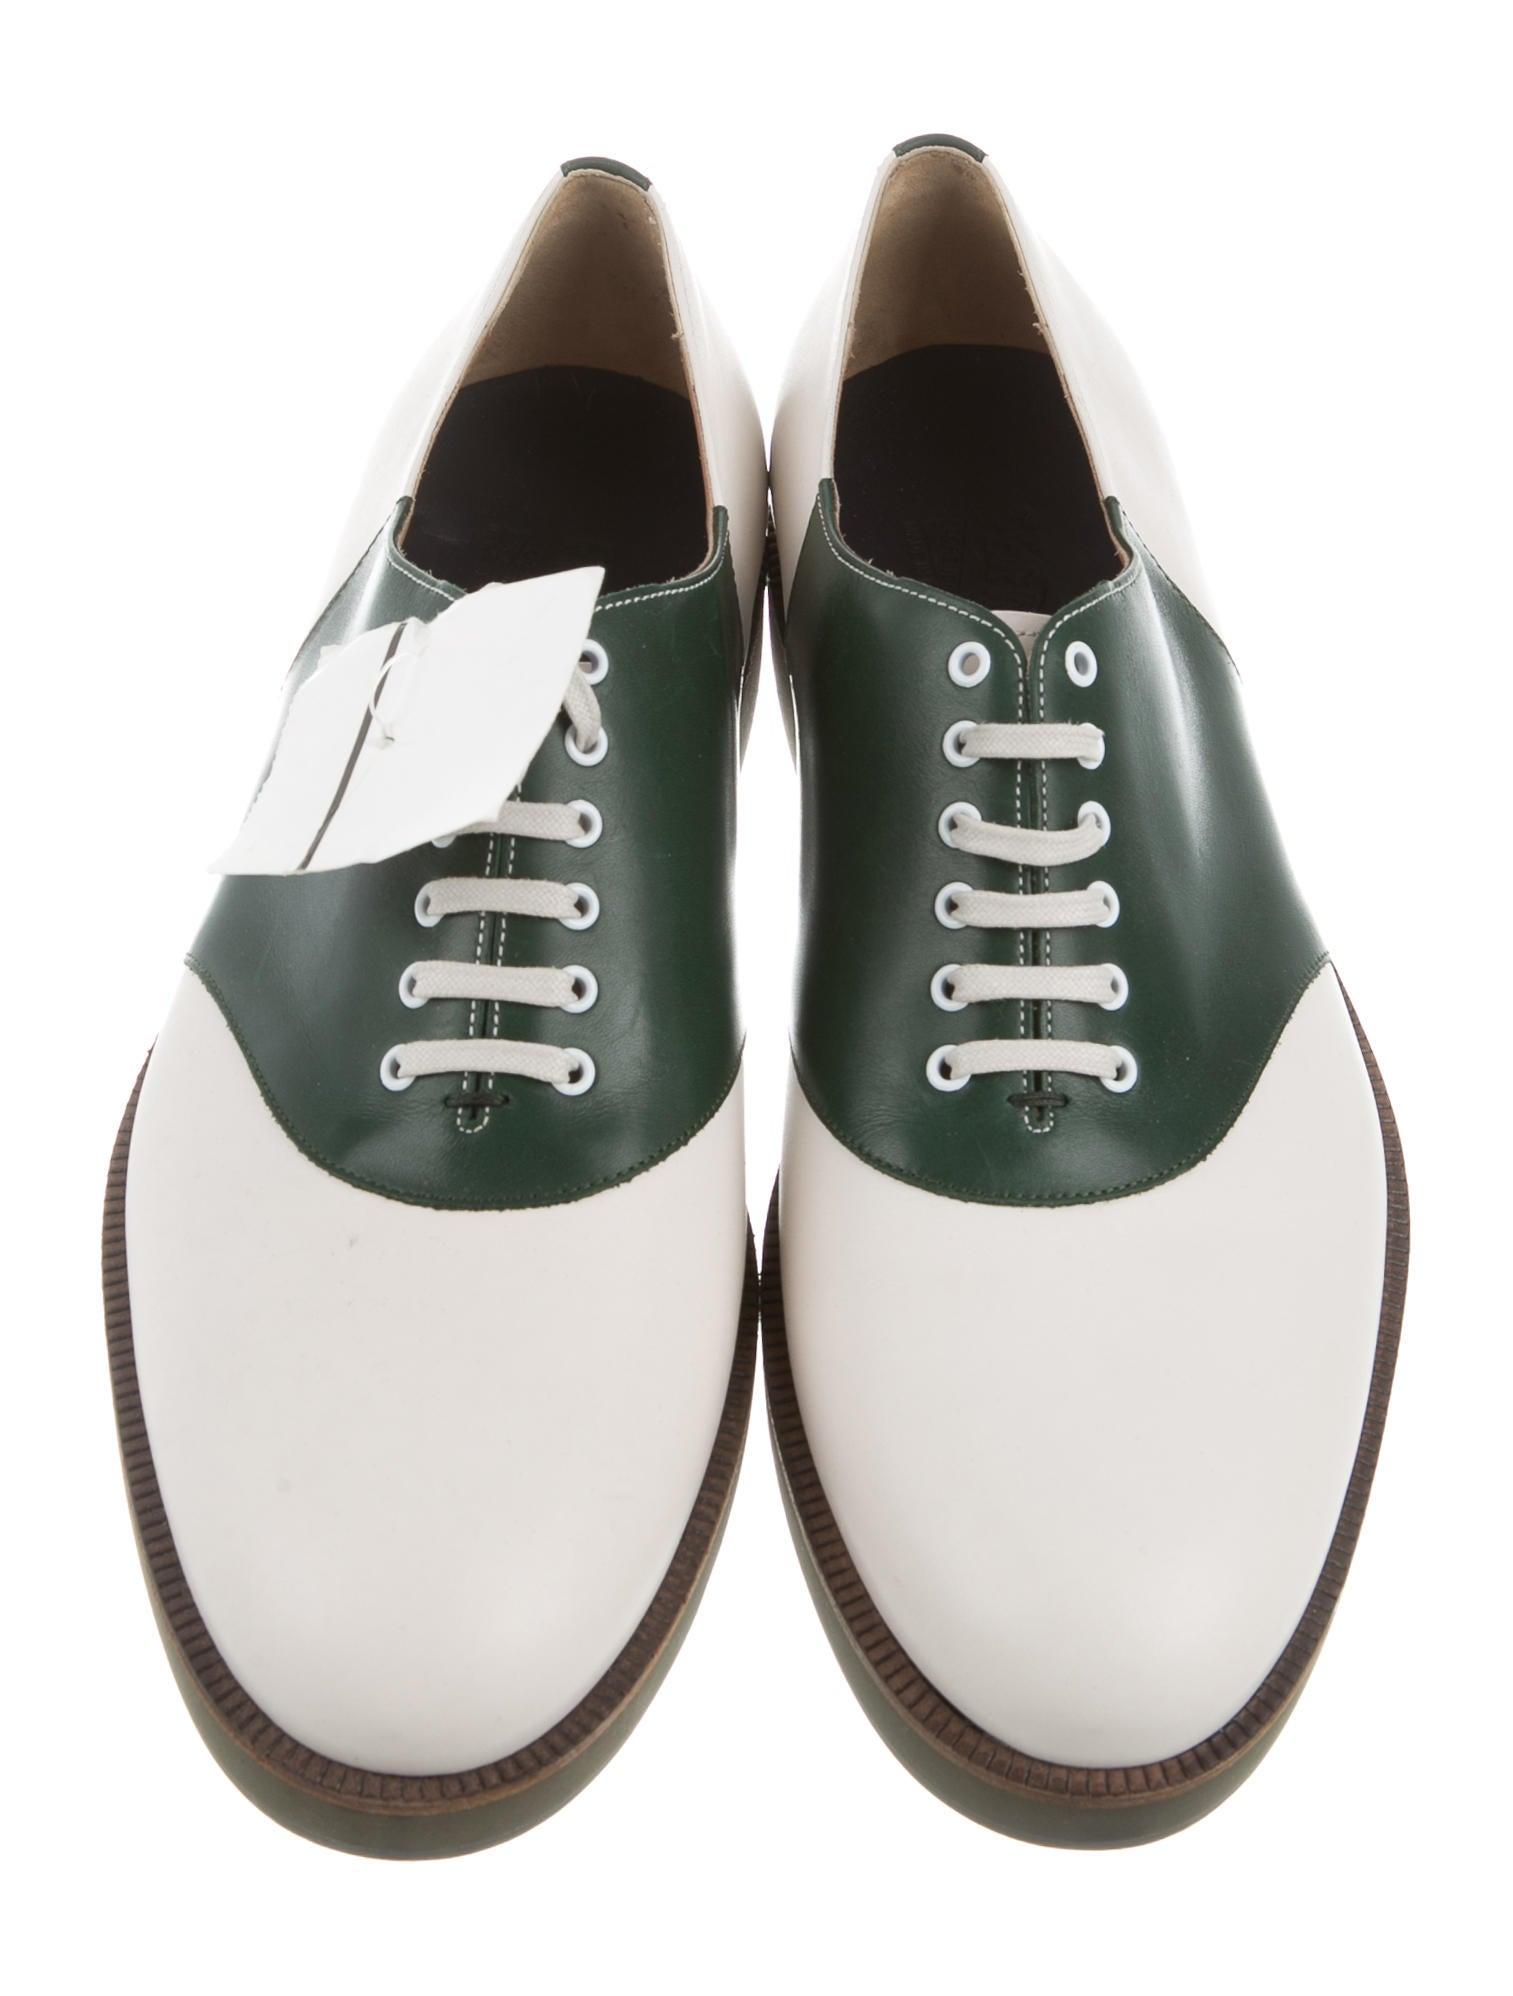 salvatore ferragamo two tone leather derby shoes shoes